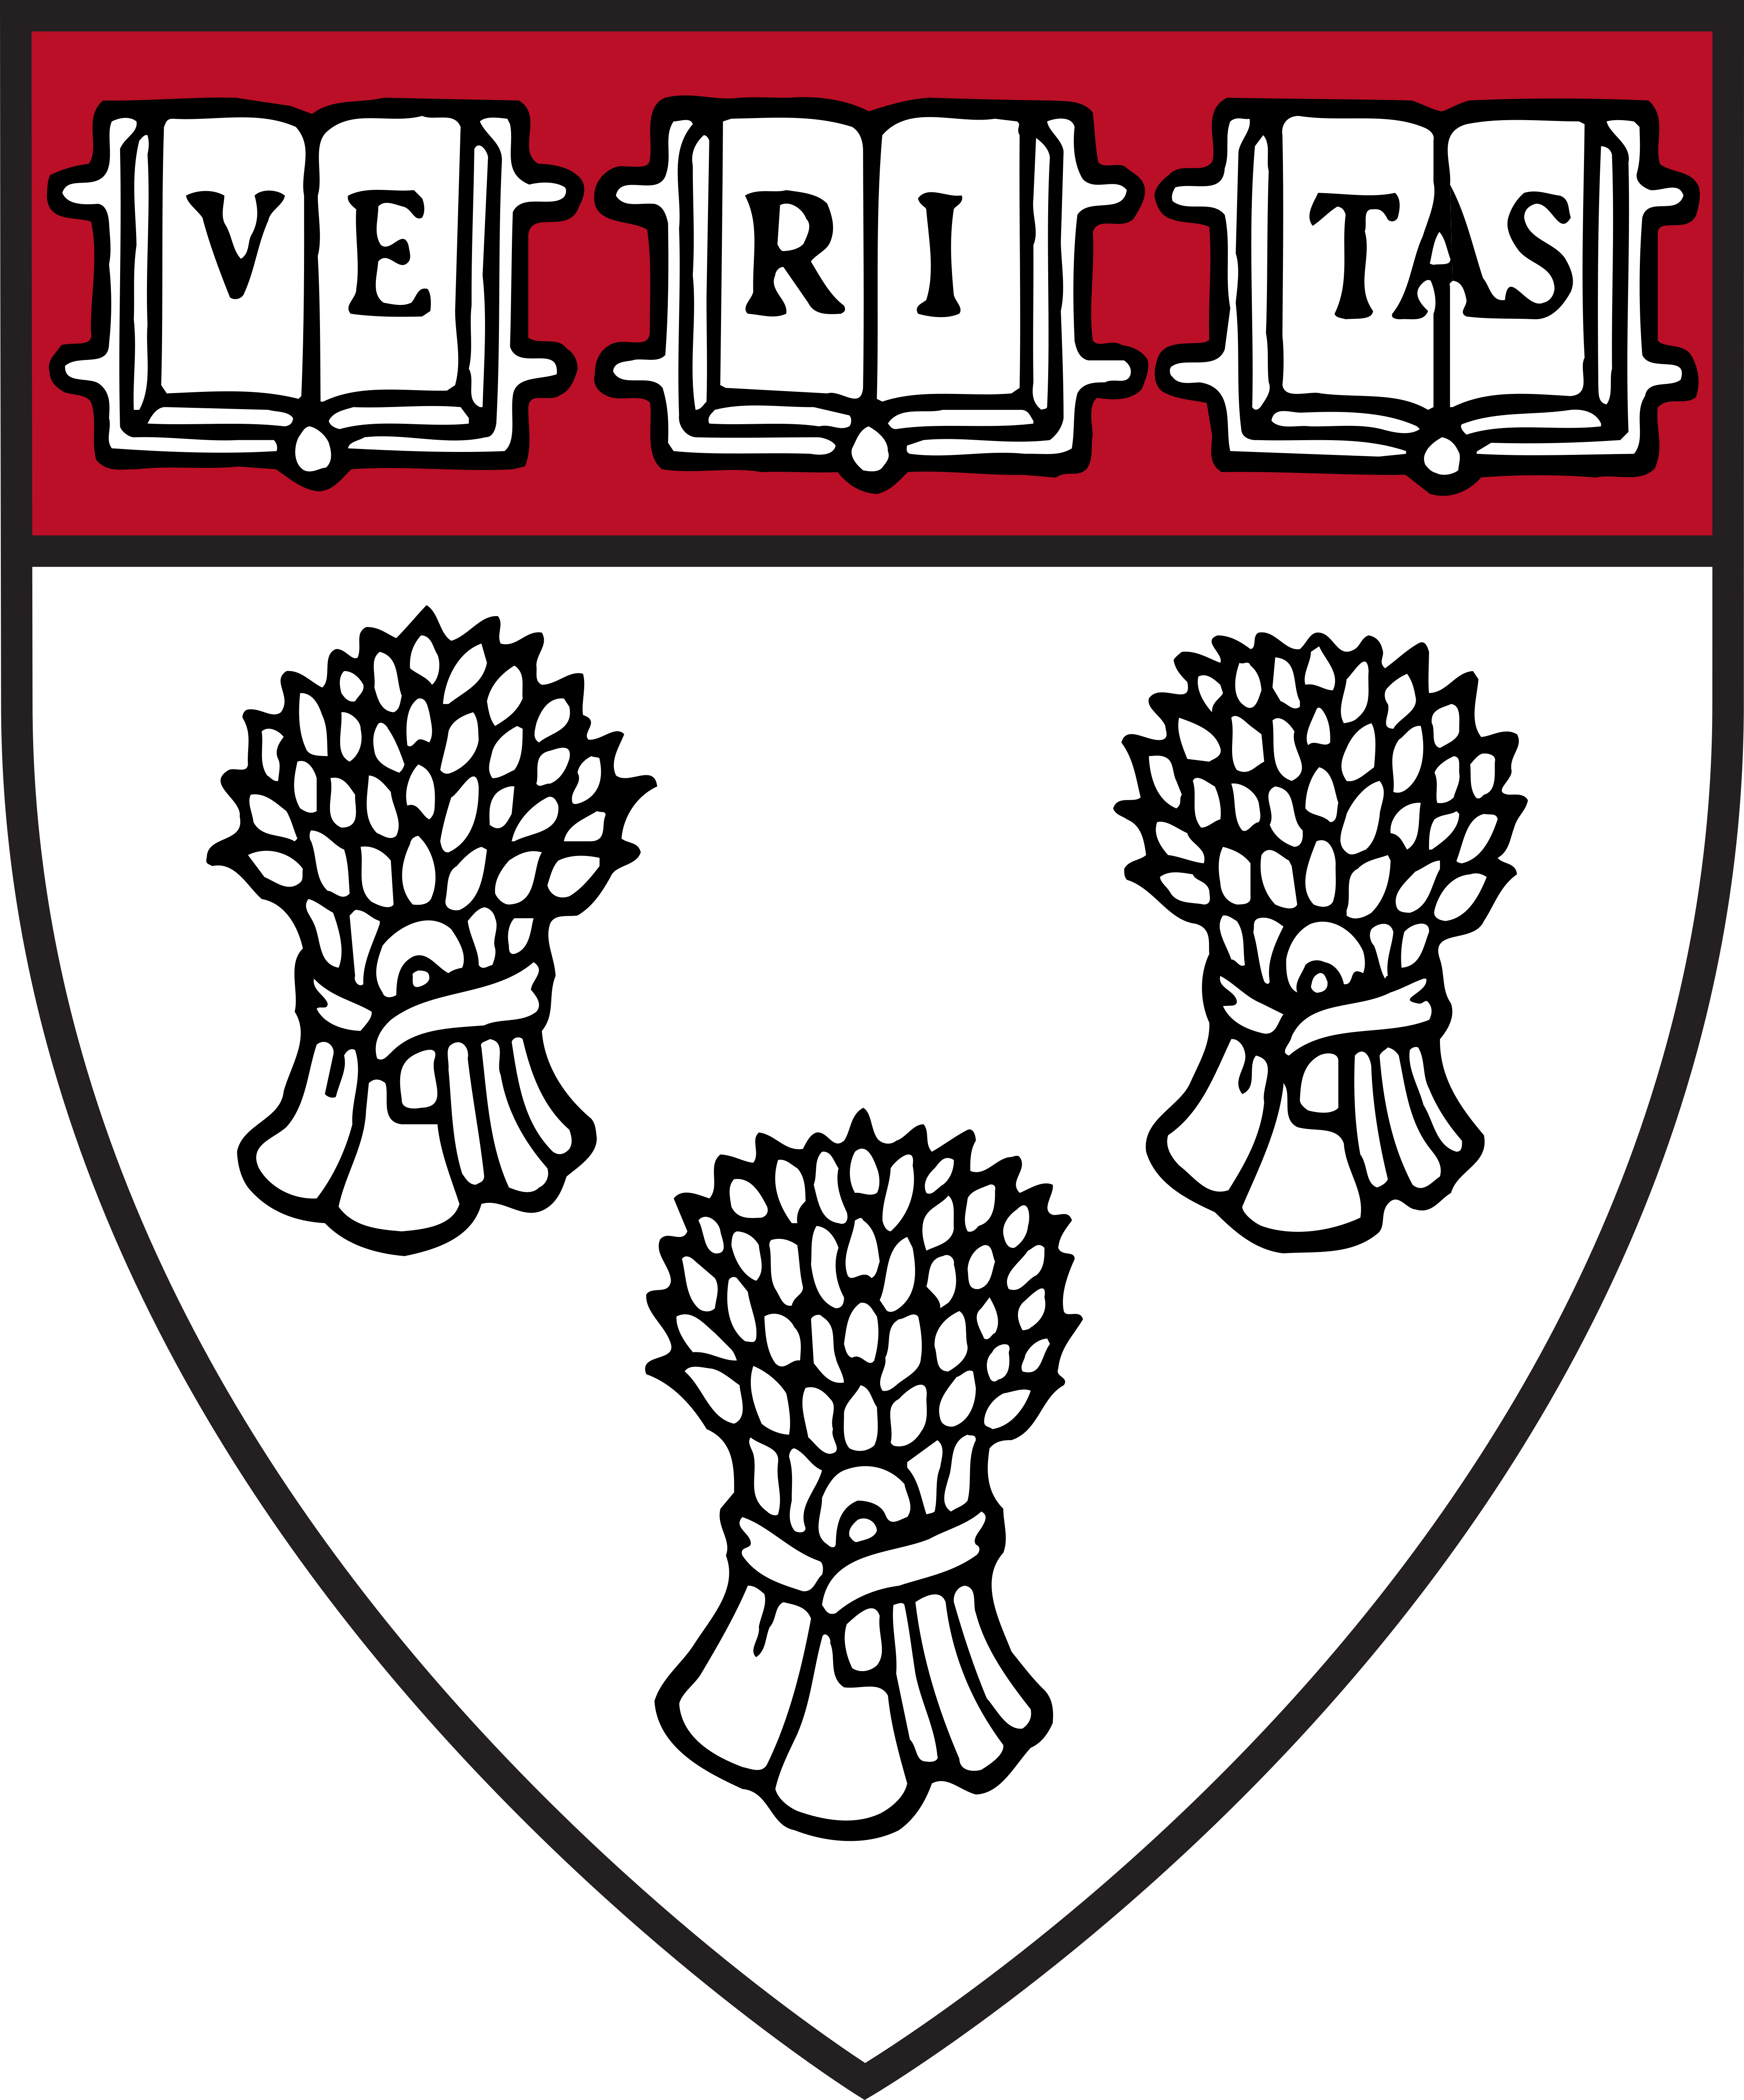 Harvard Law School Logos Download